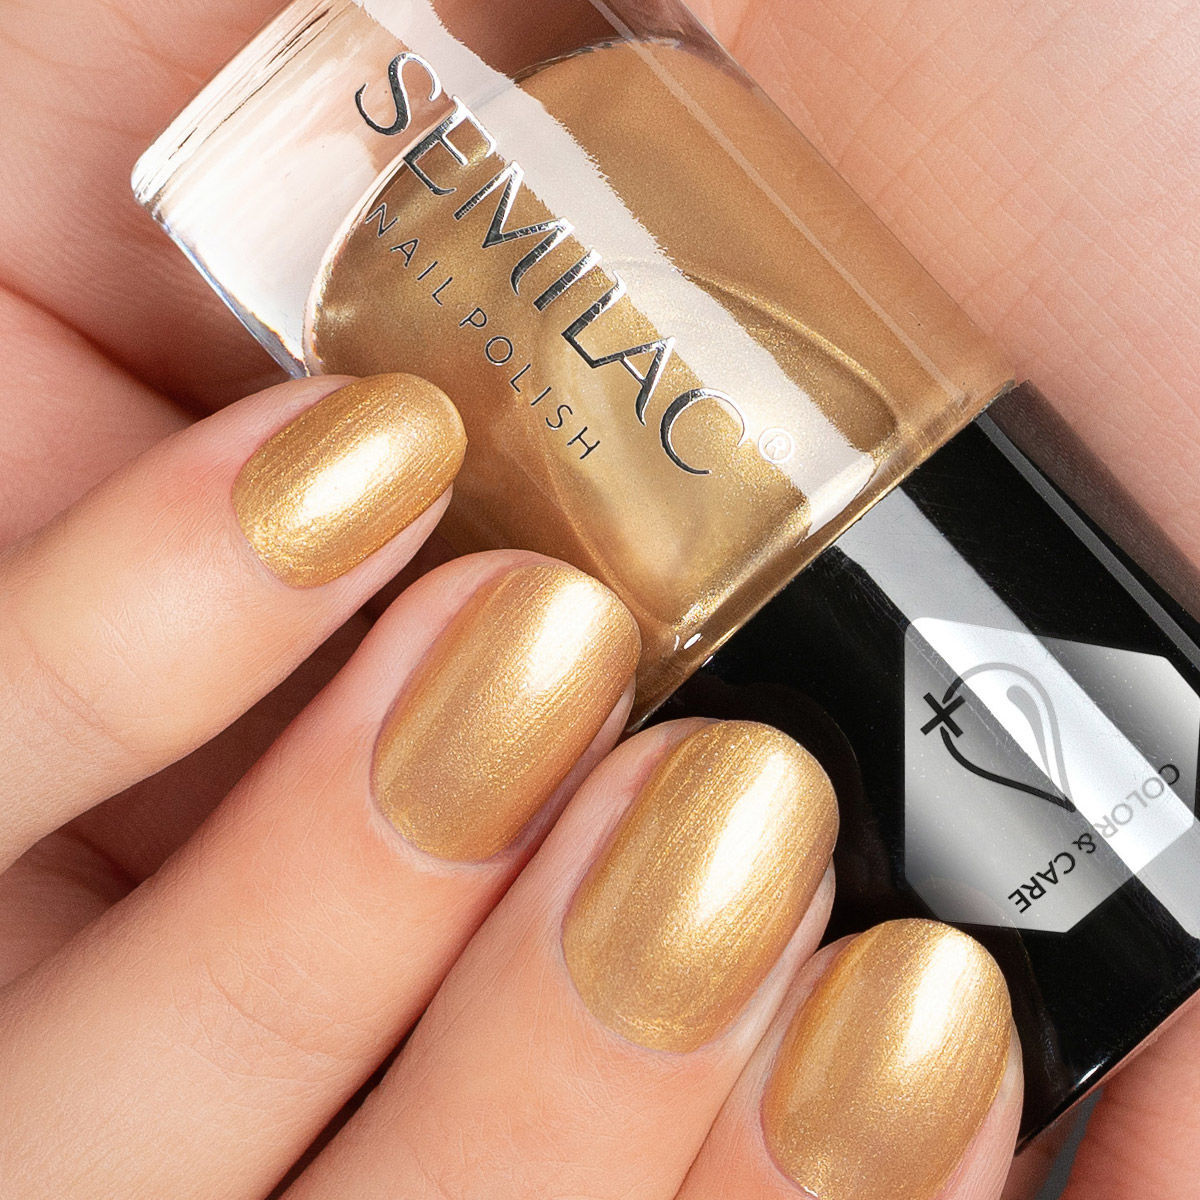 C236 CARE Semilac lakier klasyczny do paznokci